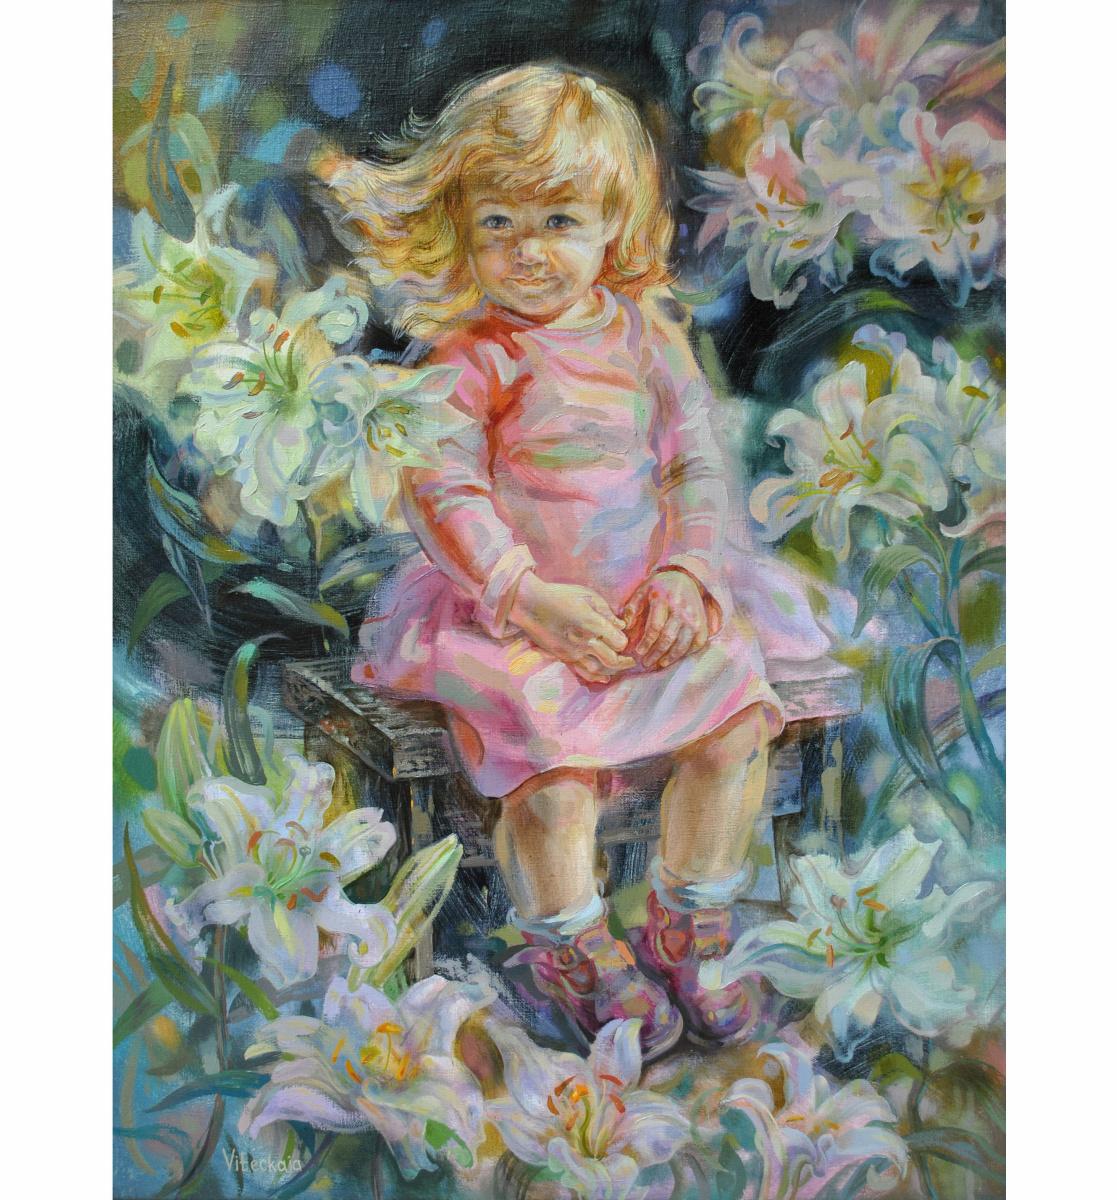 Снежана Казимировна Витецкая Viteckaja. Lily garden